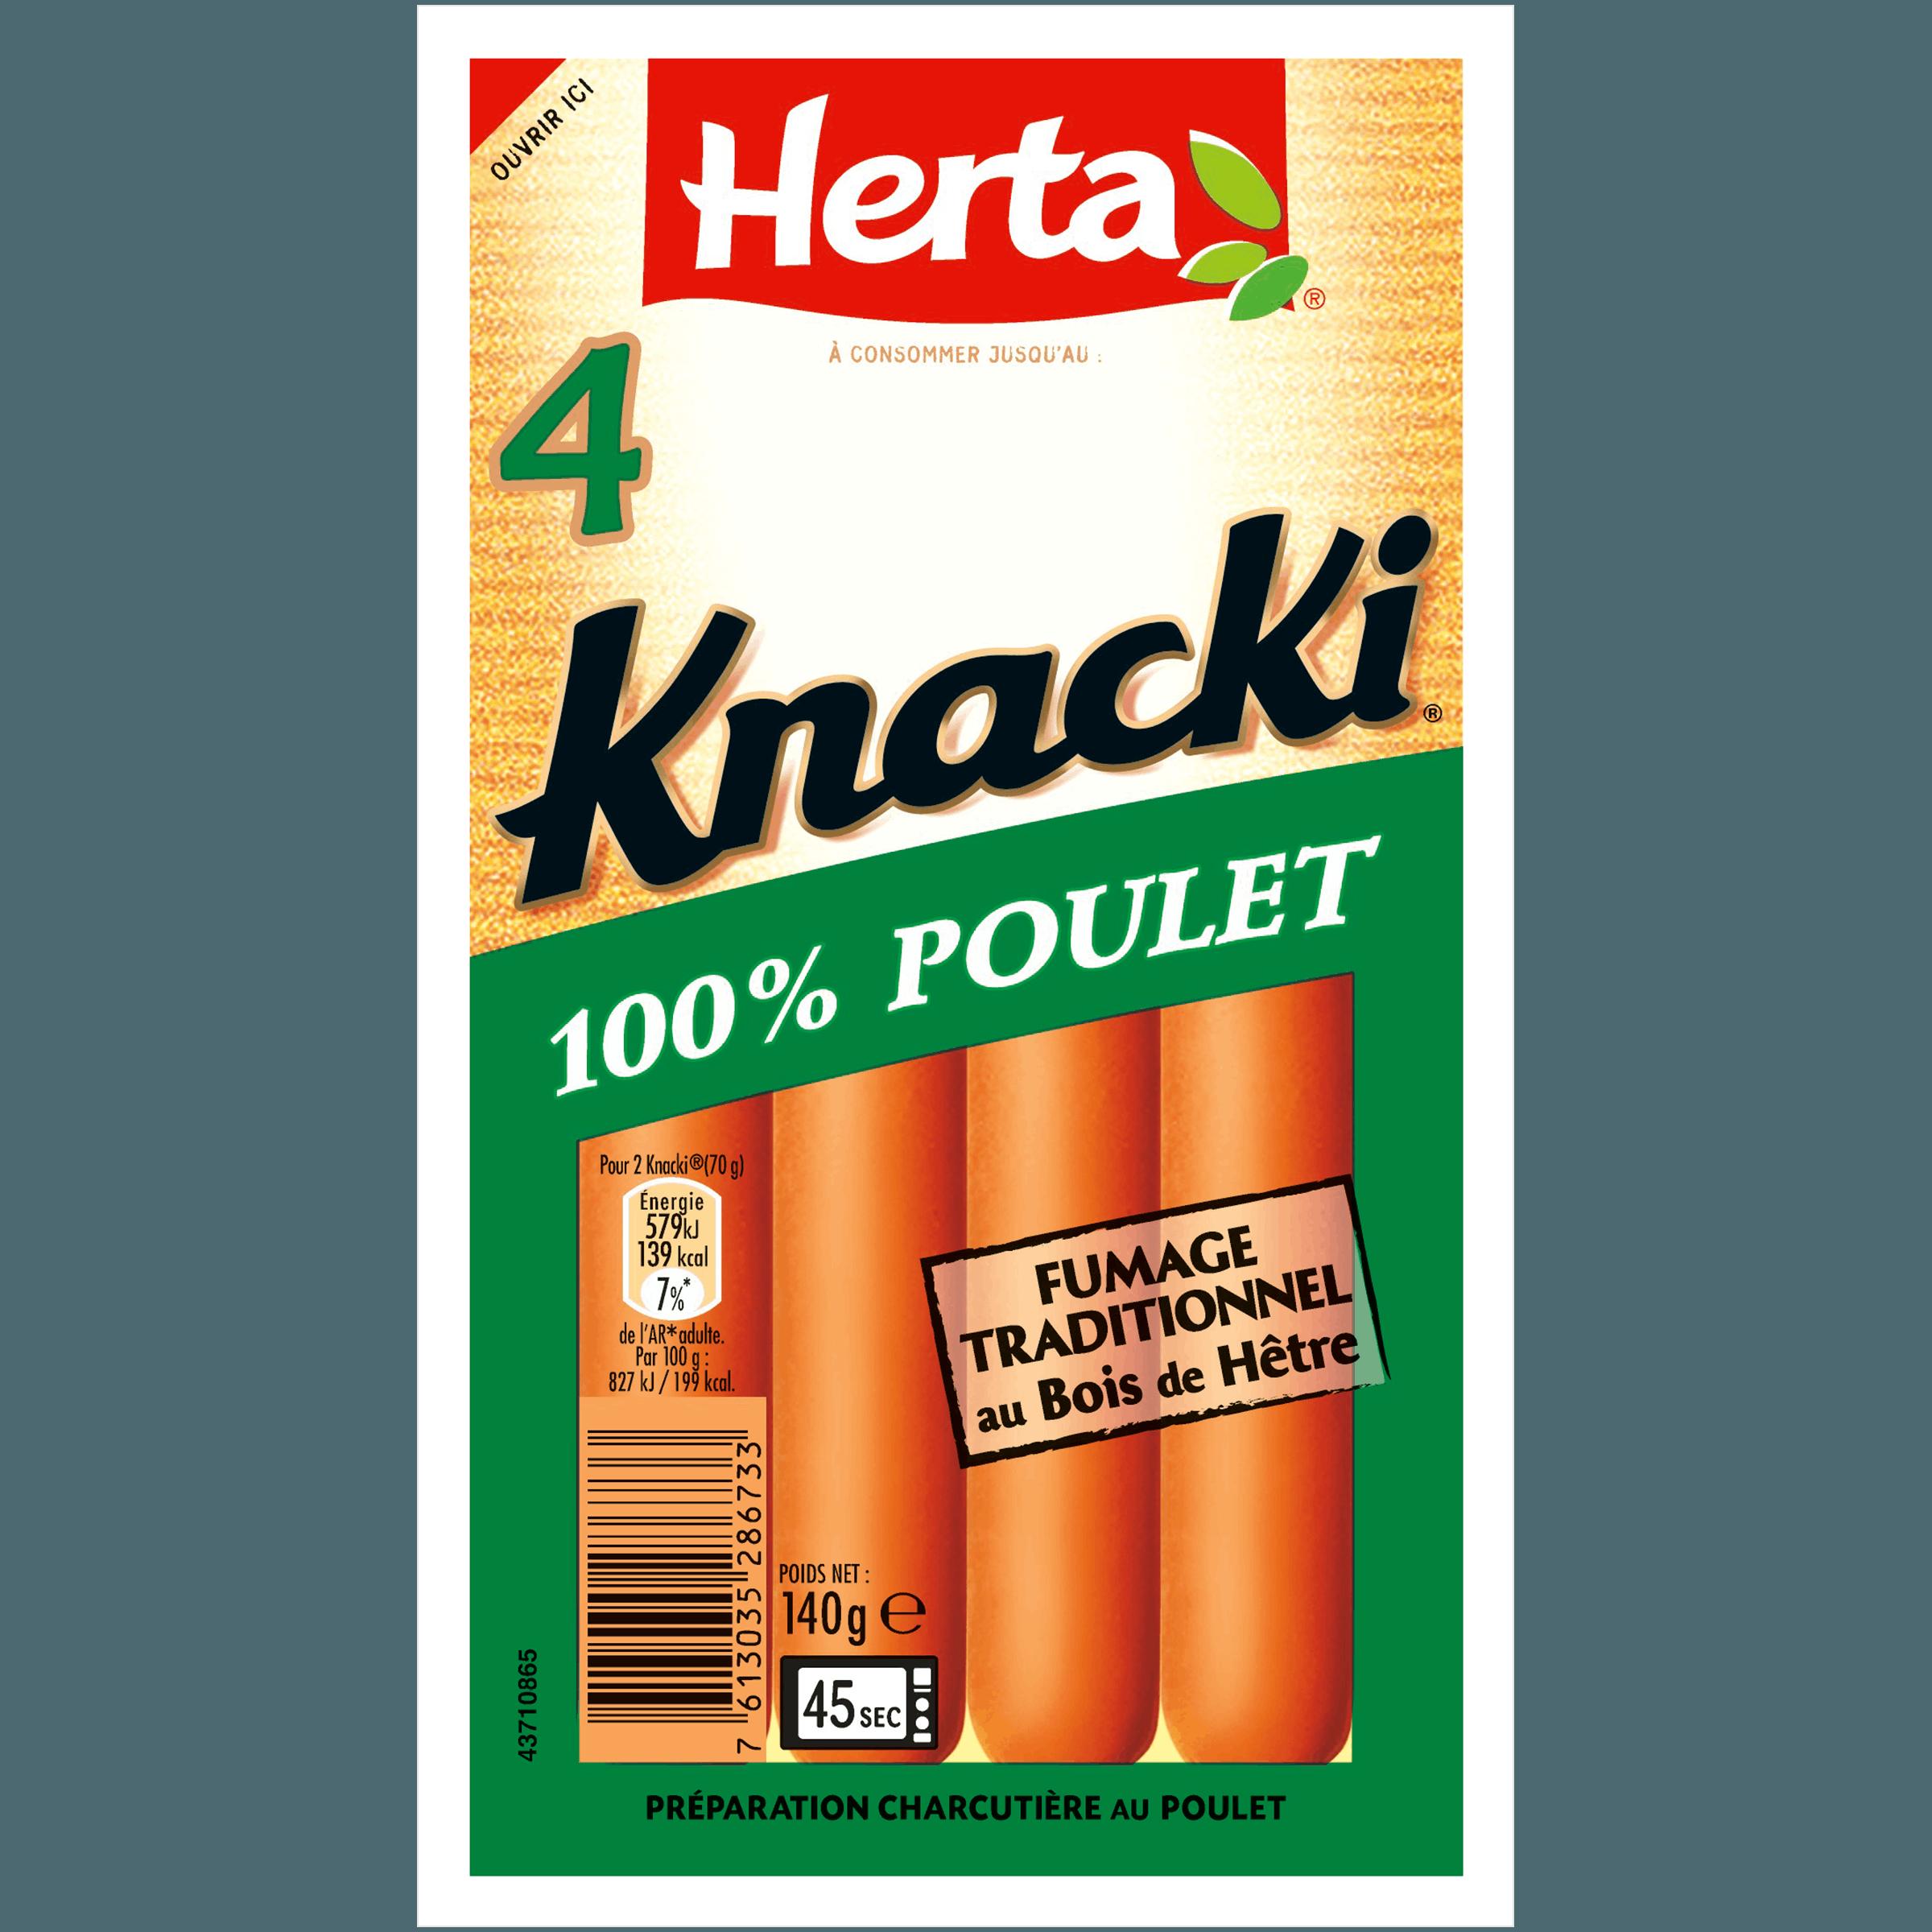 Knacki 100% poulet, Herta (x4, 140 g)